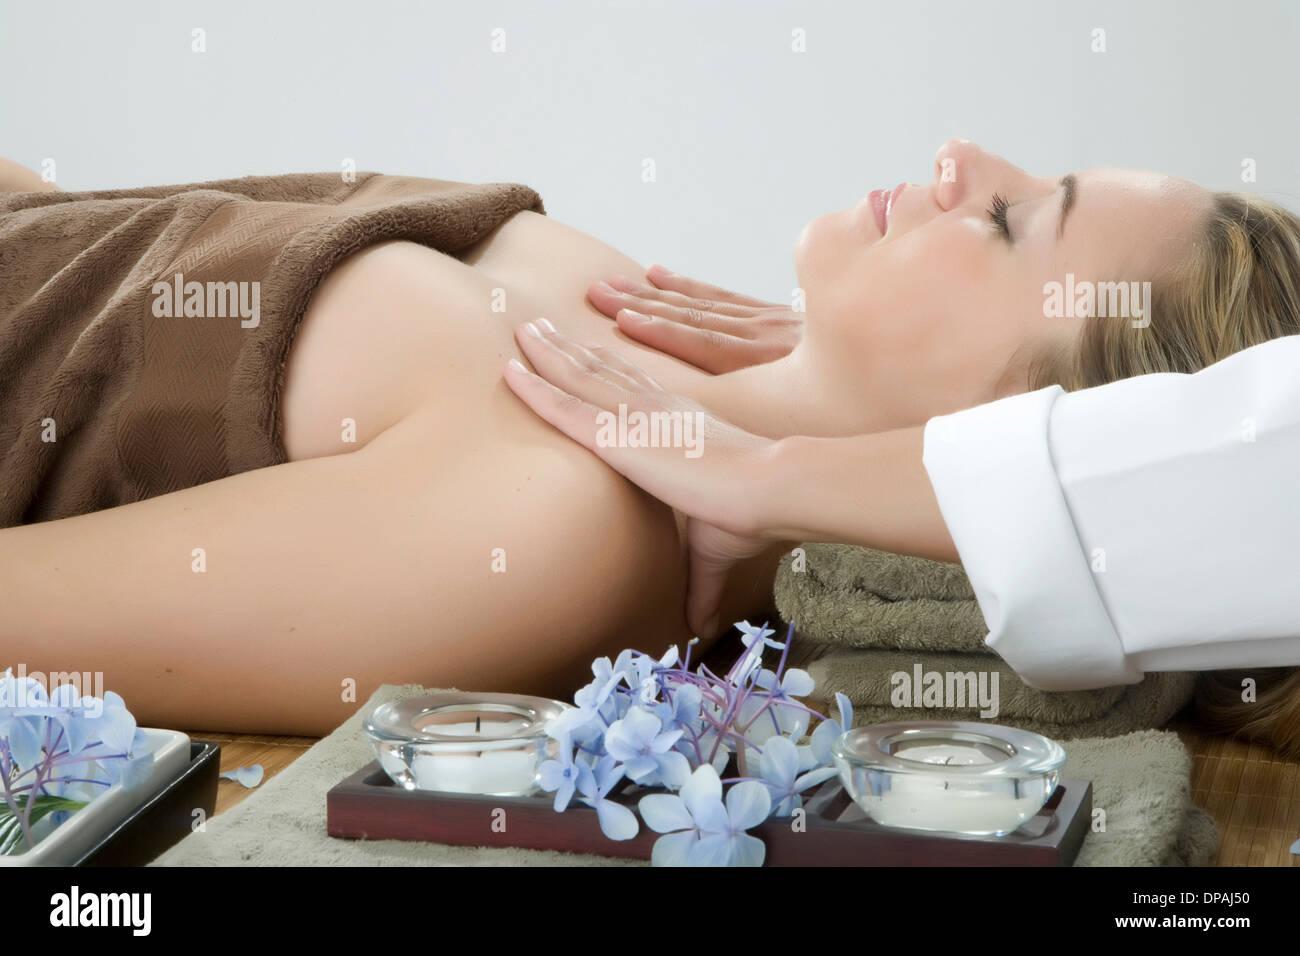 Woman having shoulder massage at spa - Stock Image